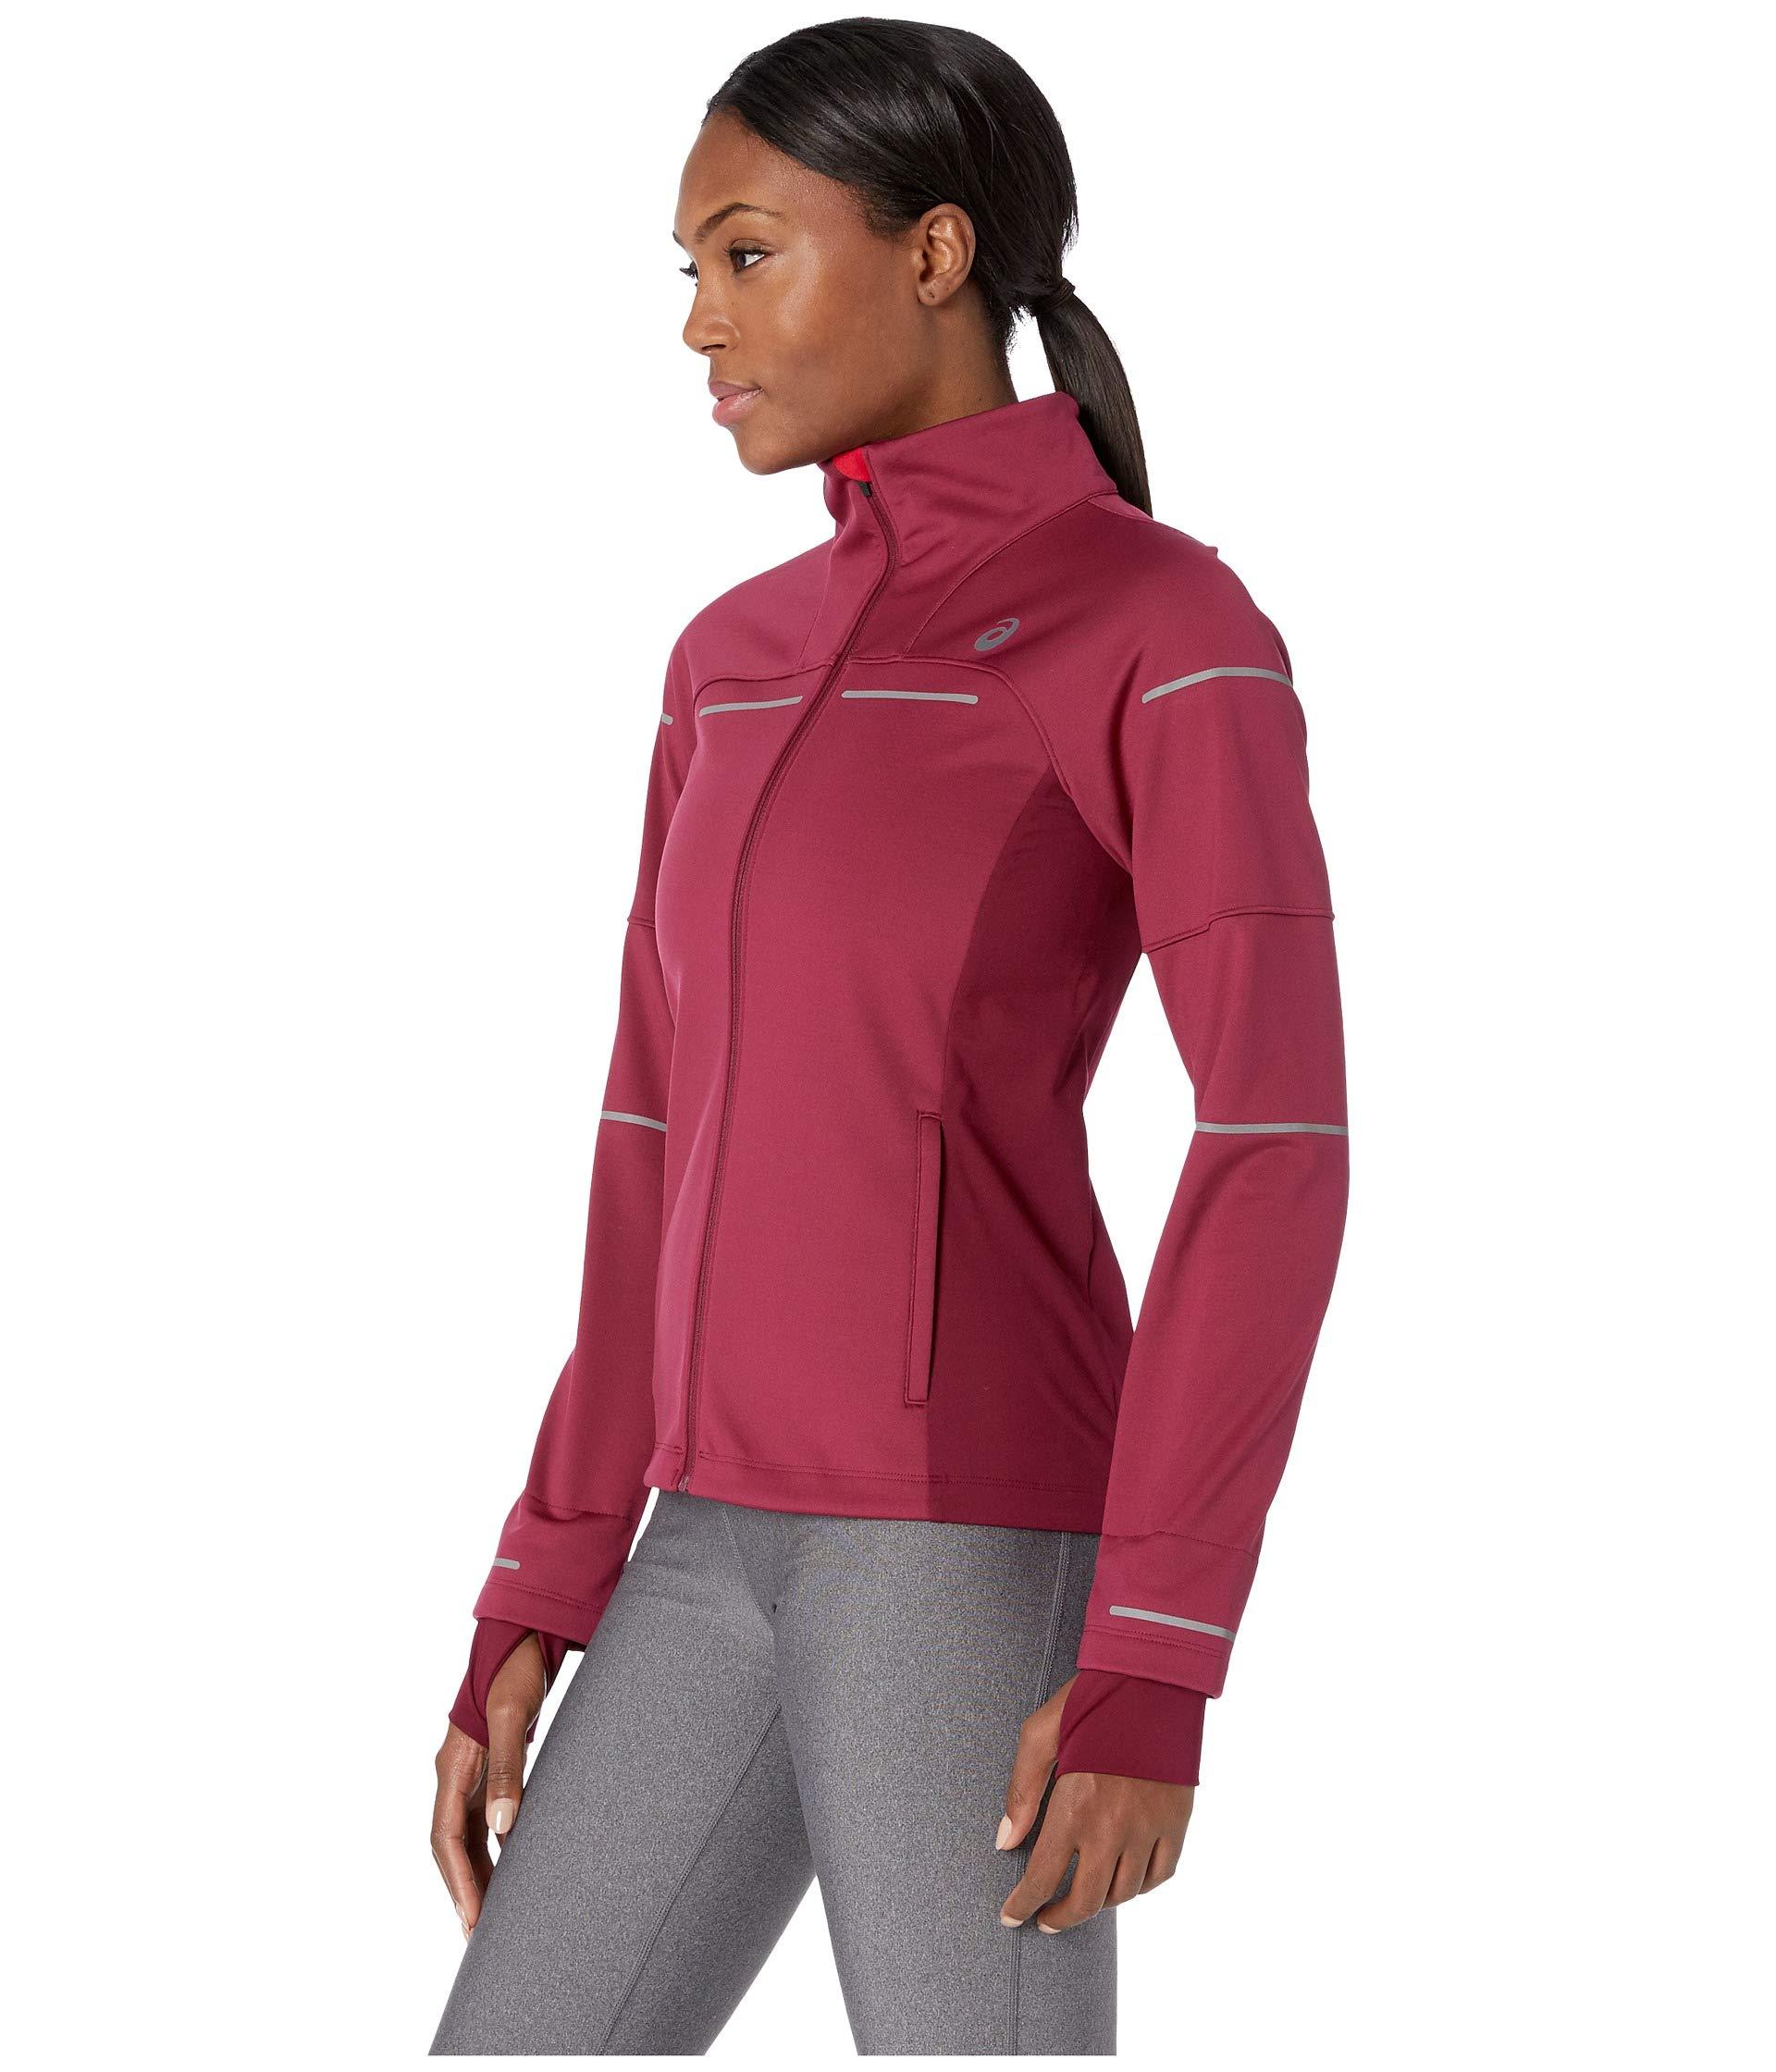 ASICS Lite-Show Winter Jacket, X-Small, Cordvan by ASICS (Image #3)